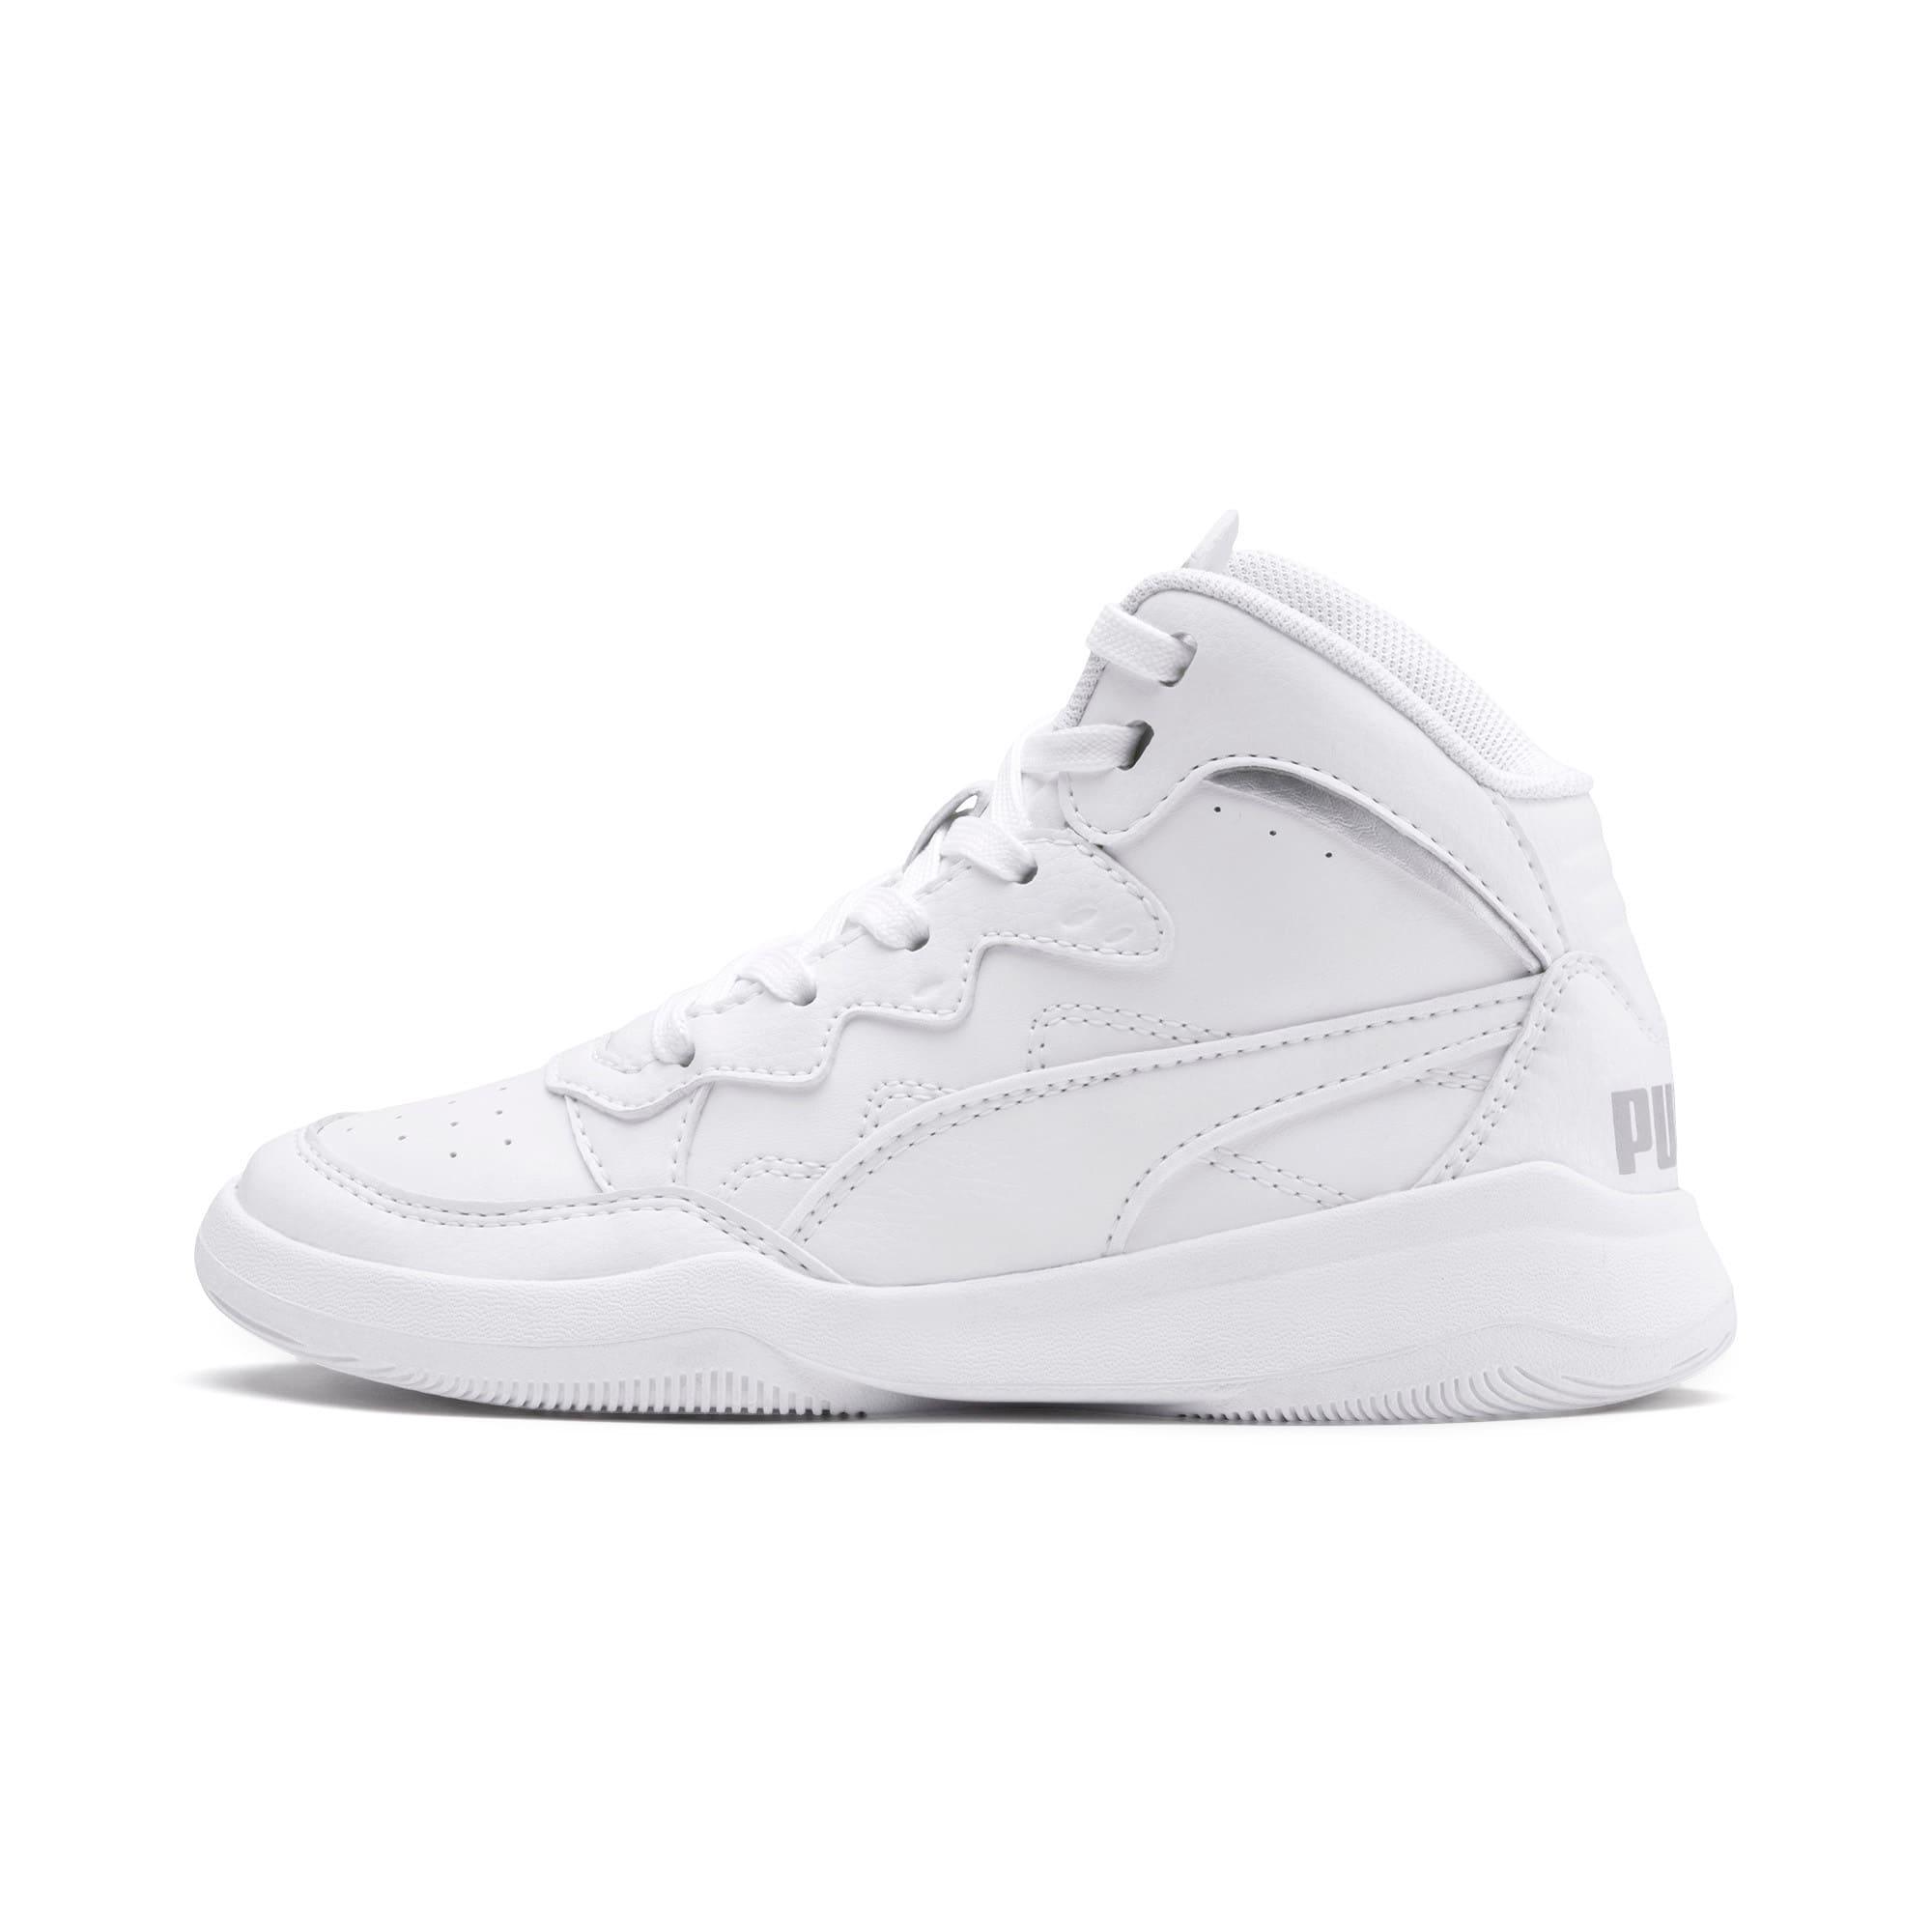 Thumbnail 1 of PUMA Rebound Playoff SL Little Kids' Shoes, Puma White-Puma Silver, medium